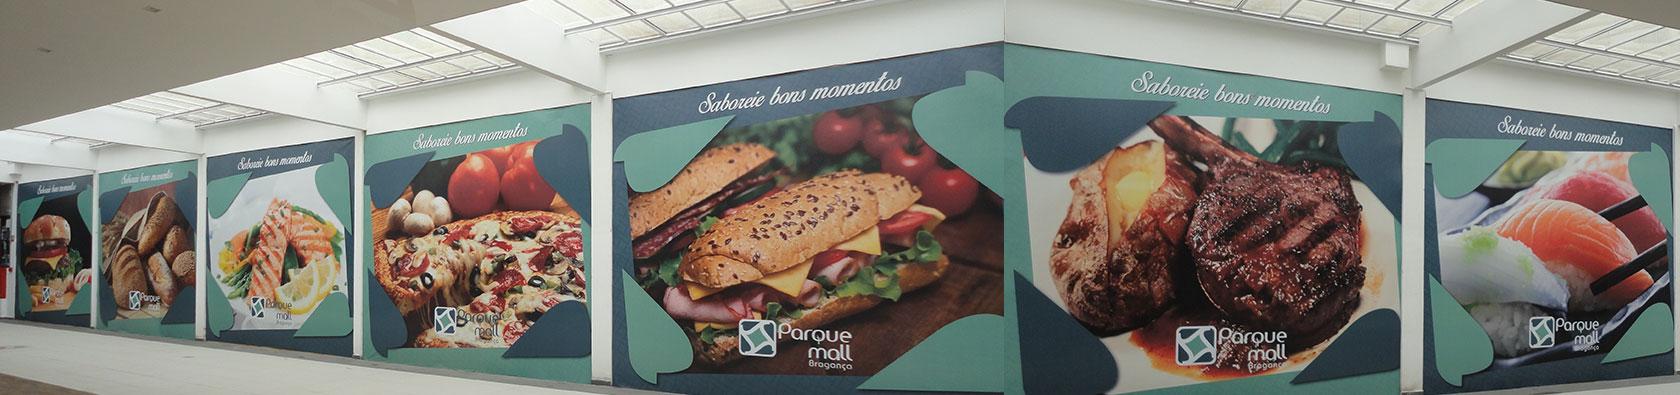 Mall-braganca-tapume